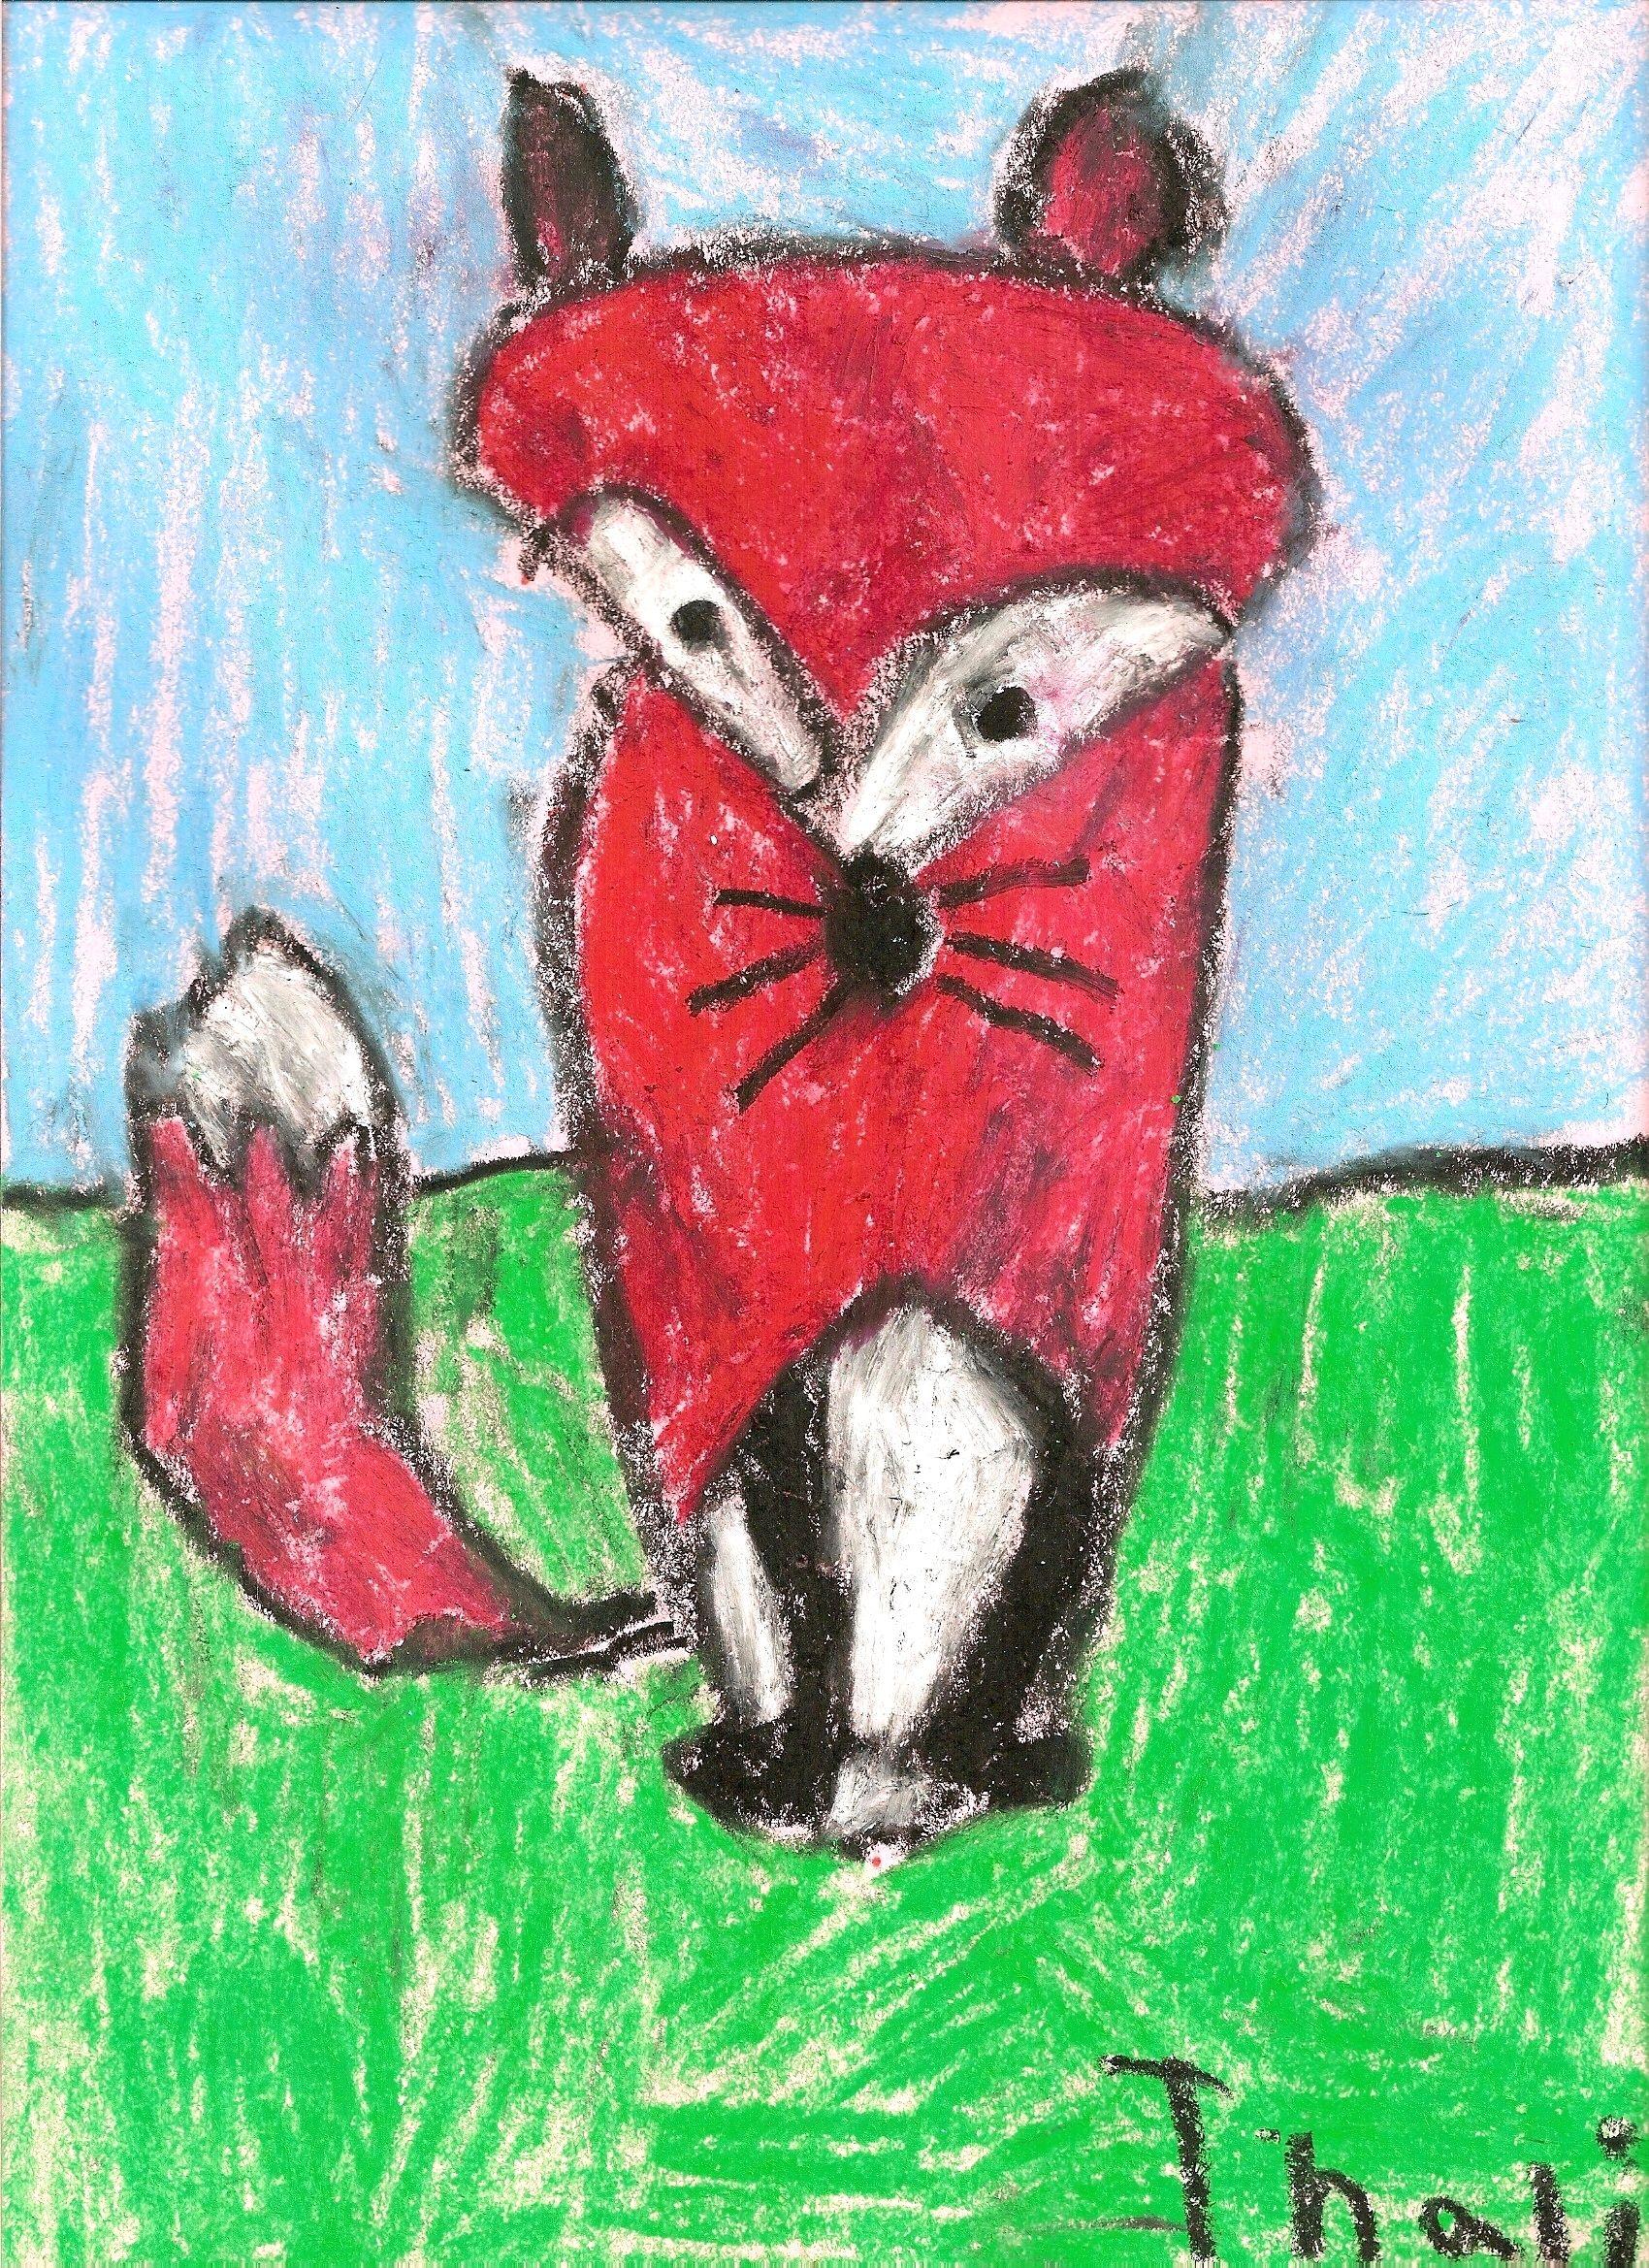 Red Fox by Thalia  Oil Pastel